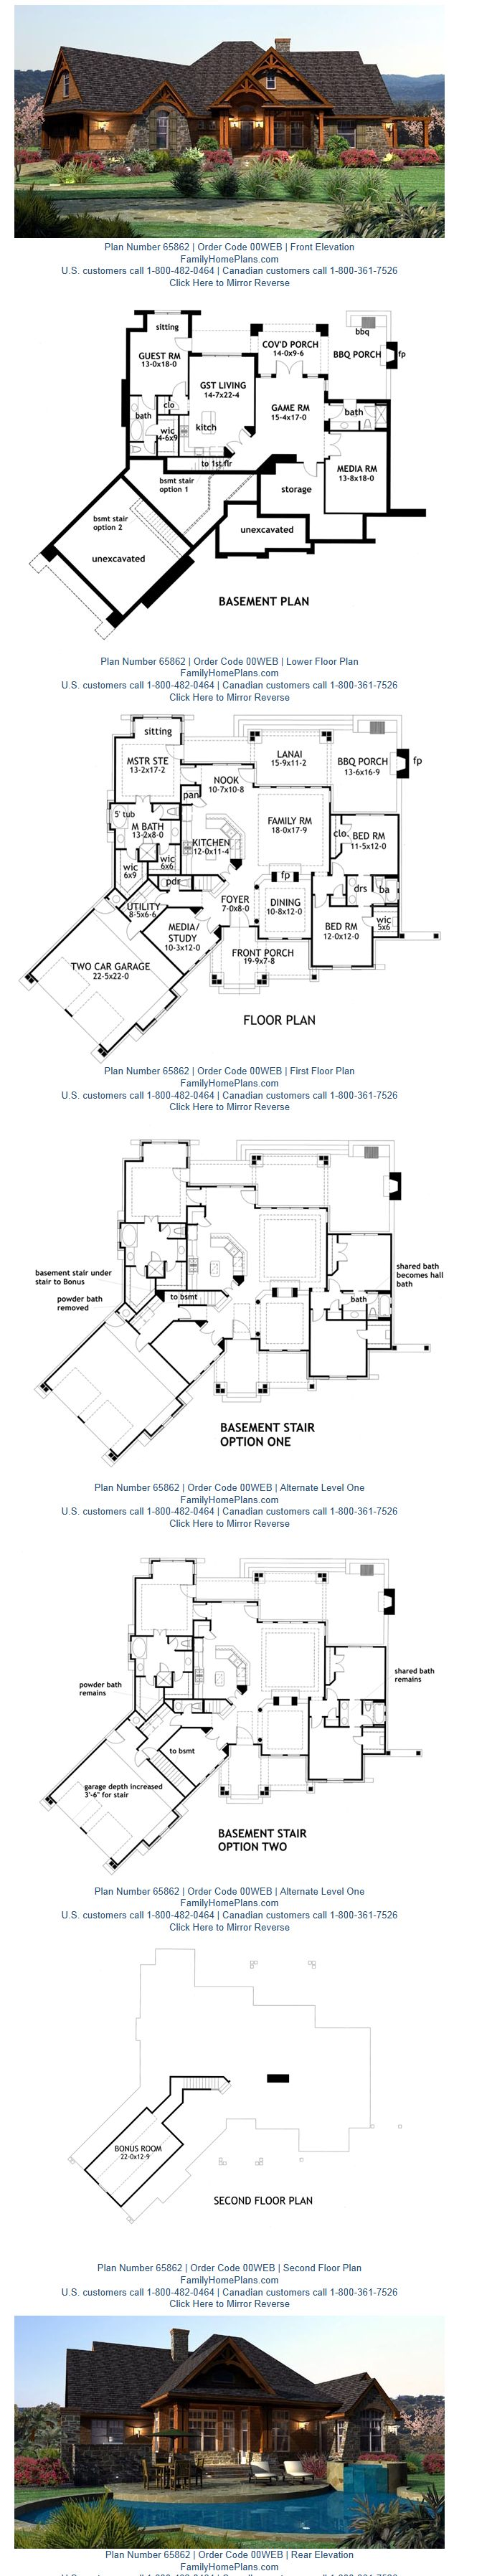 best 25 open floor plans ideas on pinterest open floor house